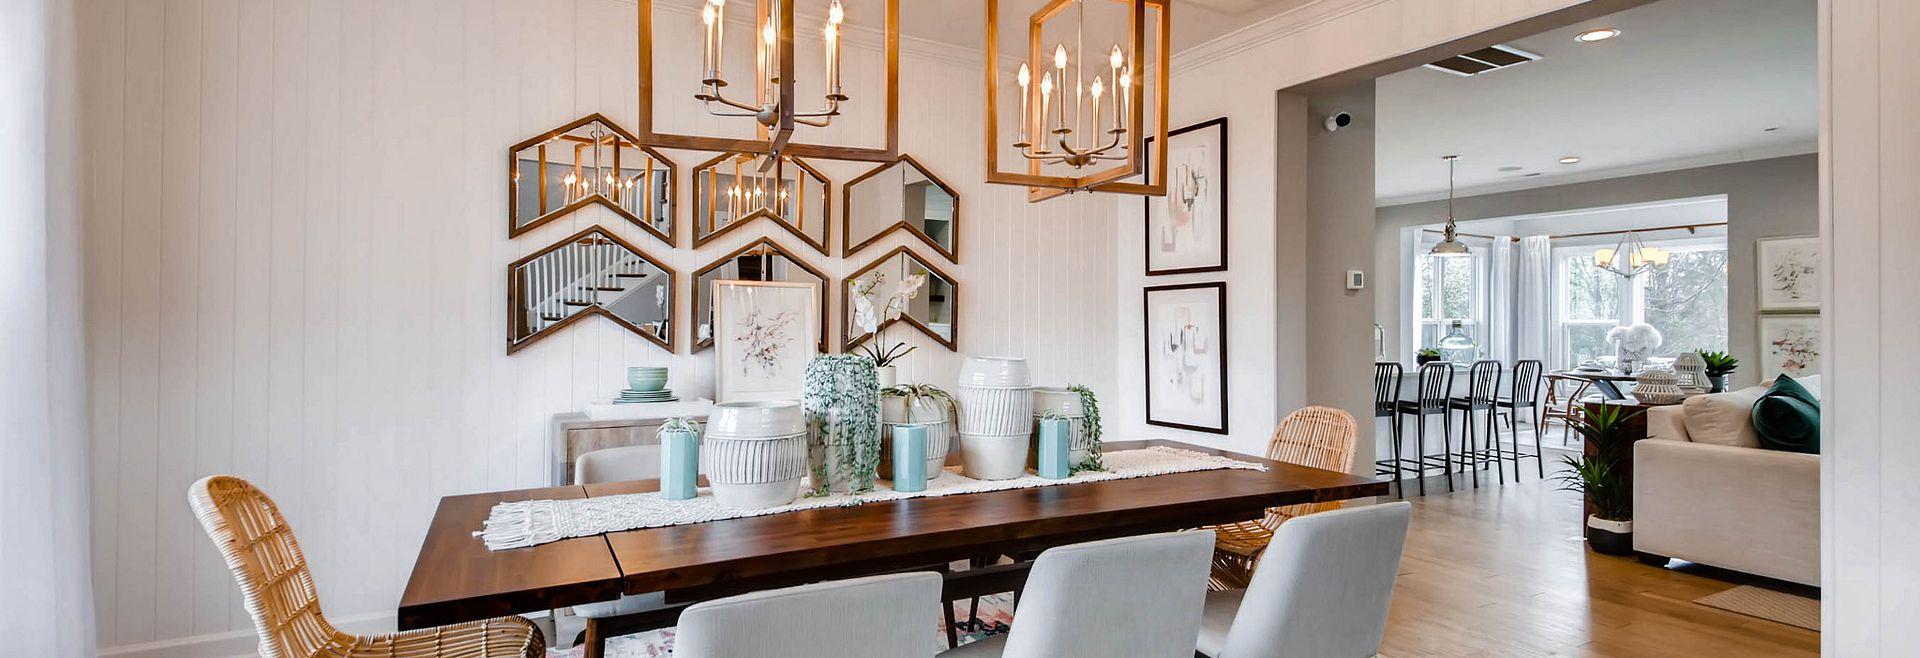 Cambridge Model Dining Room